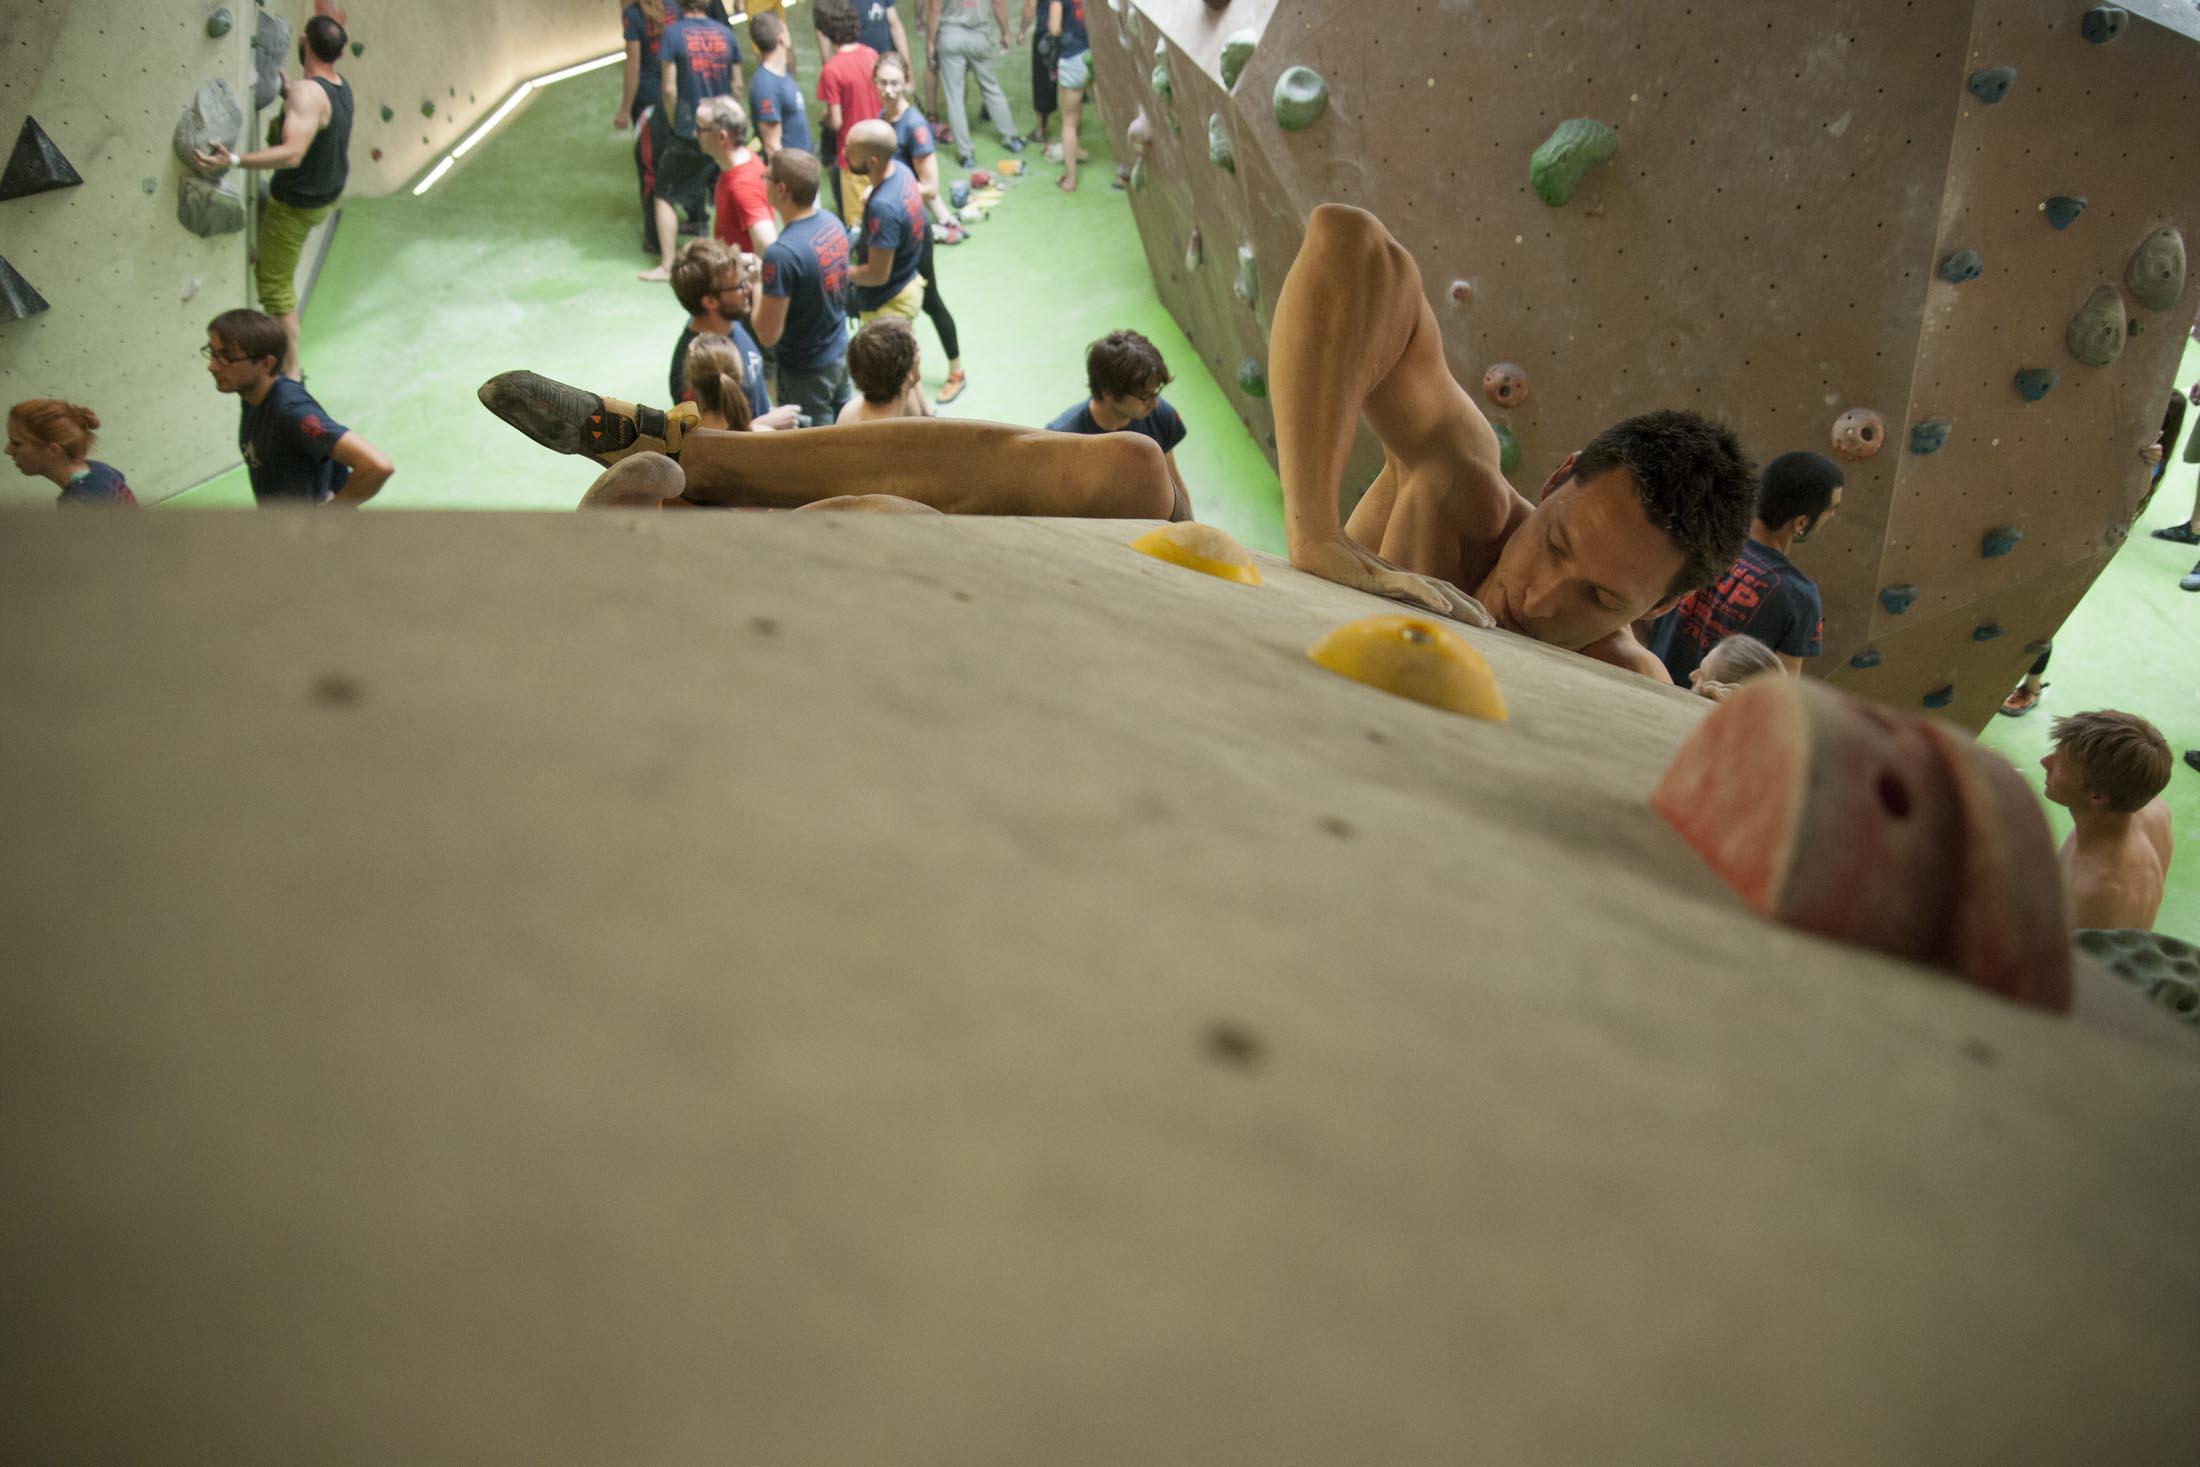 Quali, internationaler bouldercup Frankenjura 2016, BLOCKHELDEN Erlangen, Mammut, Bergfreunde.de, Boulderwettkampf07092016327